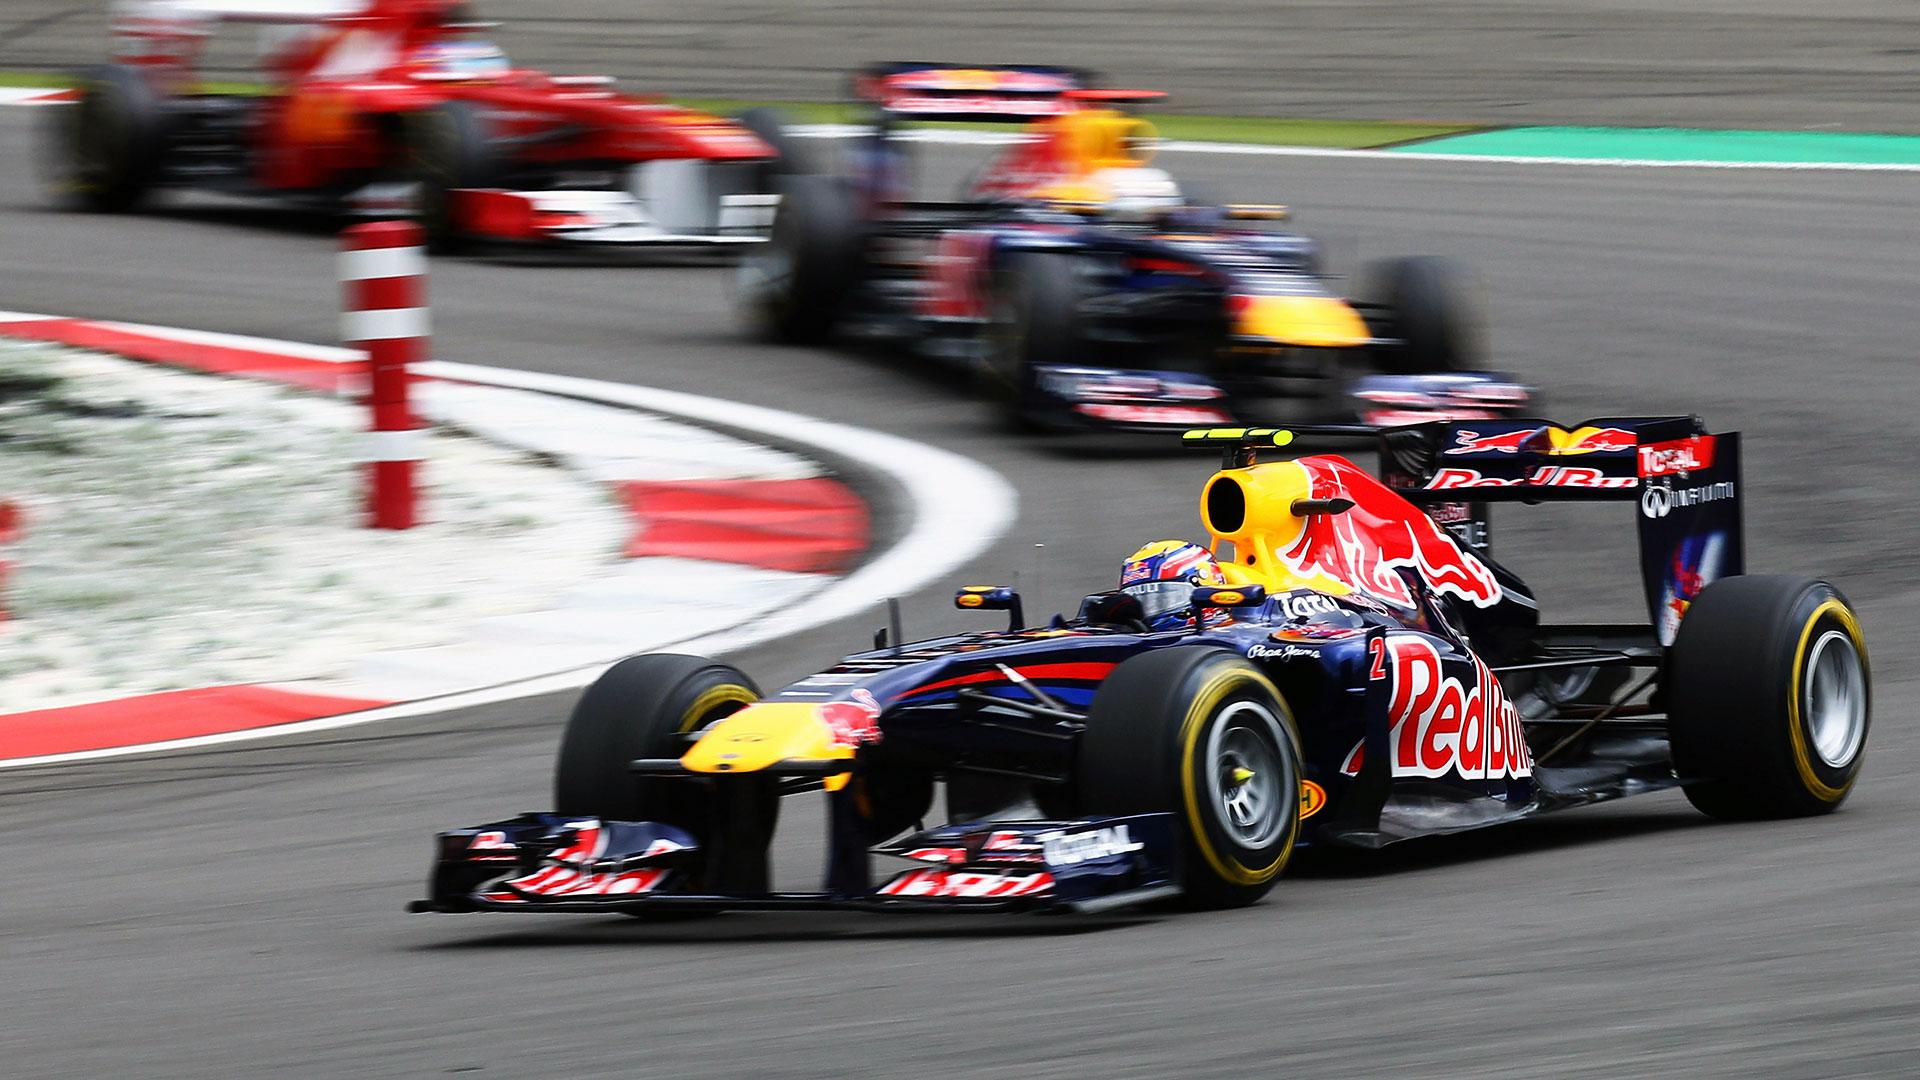 formula 1 wallpapers hd   NV Racing News 1920x1080